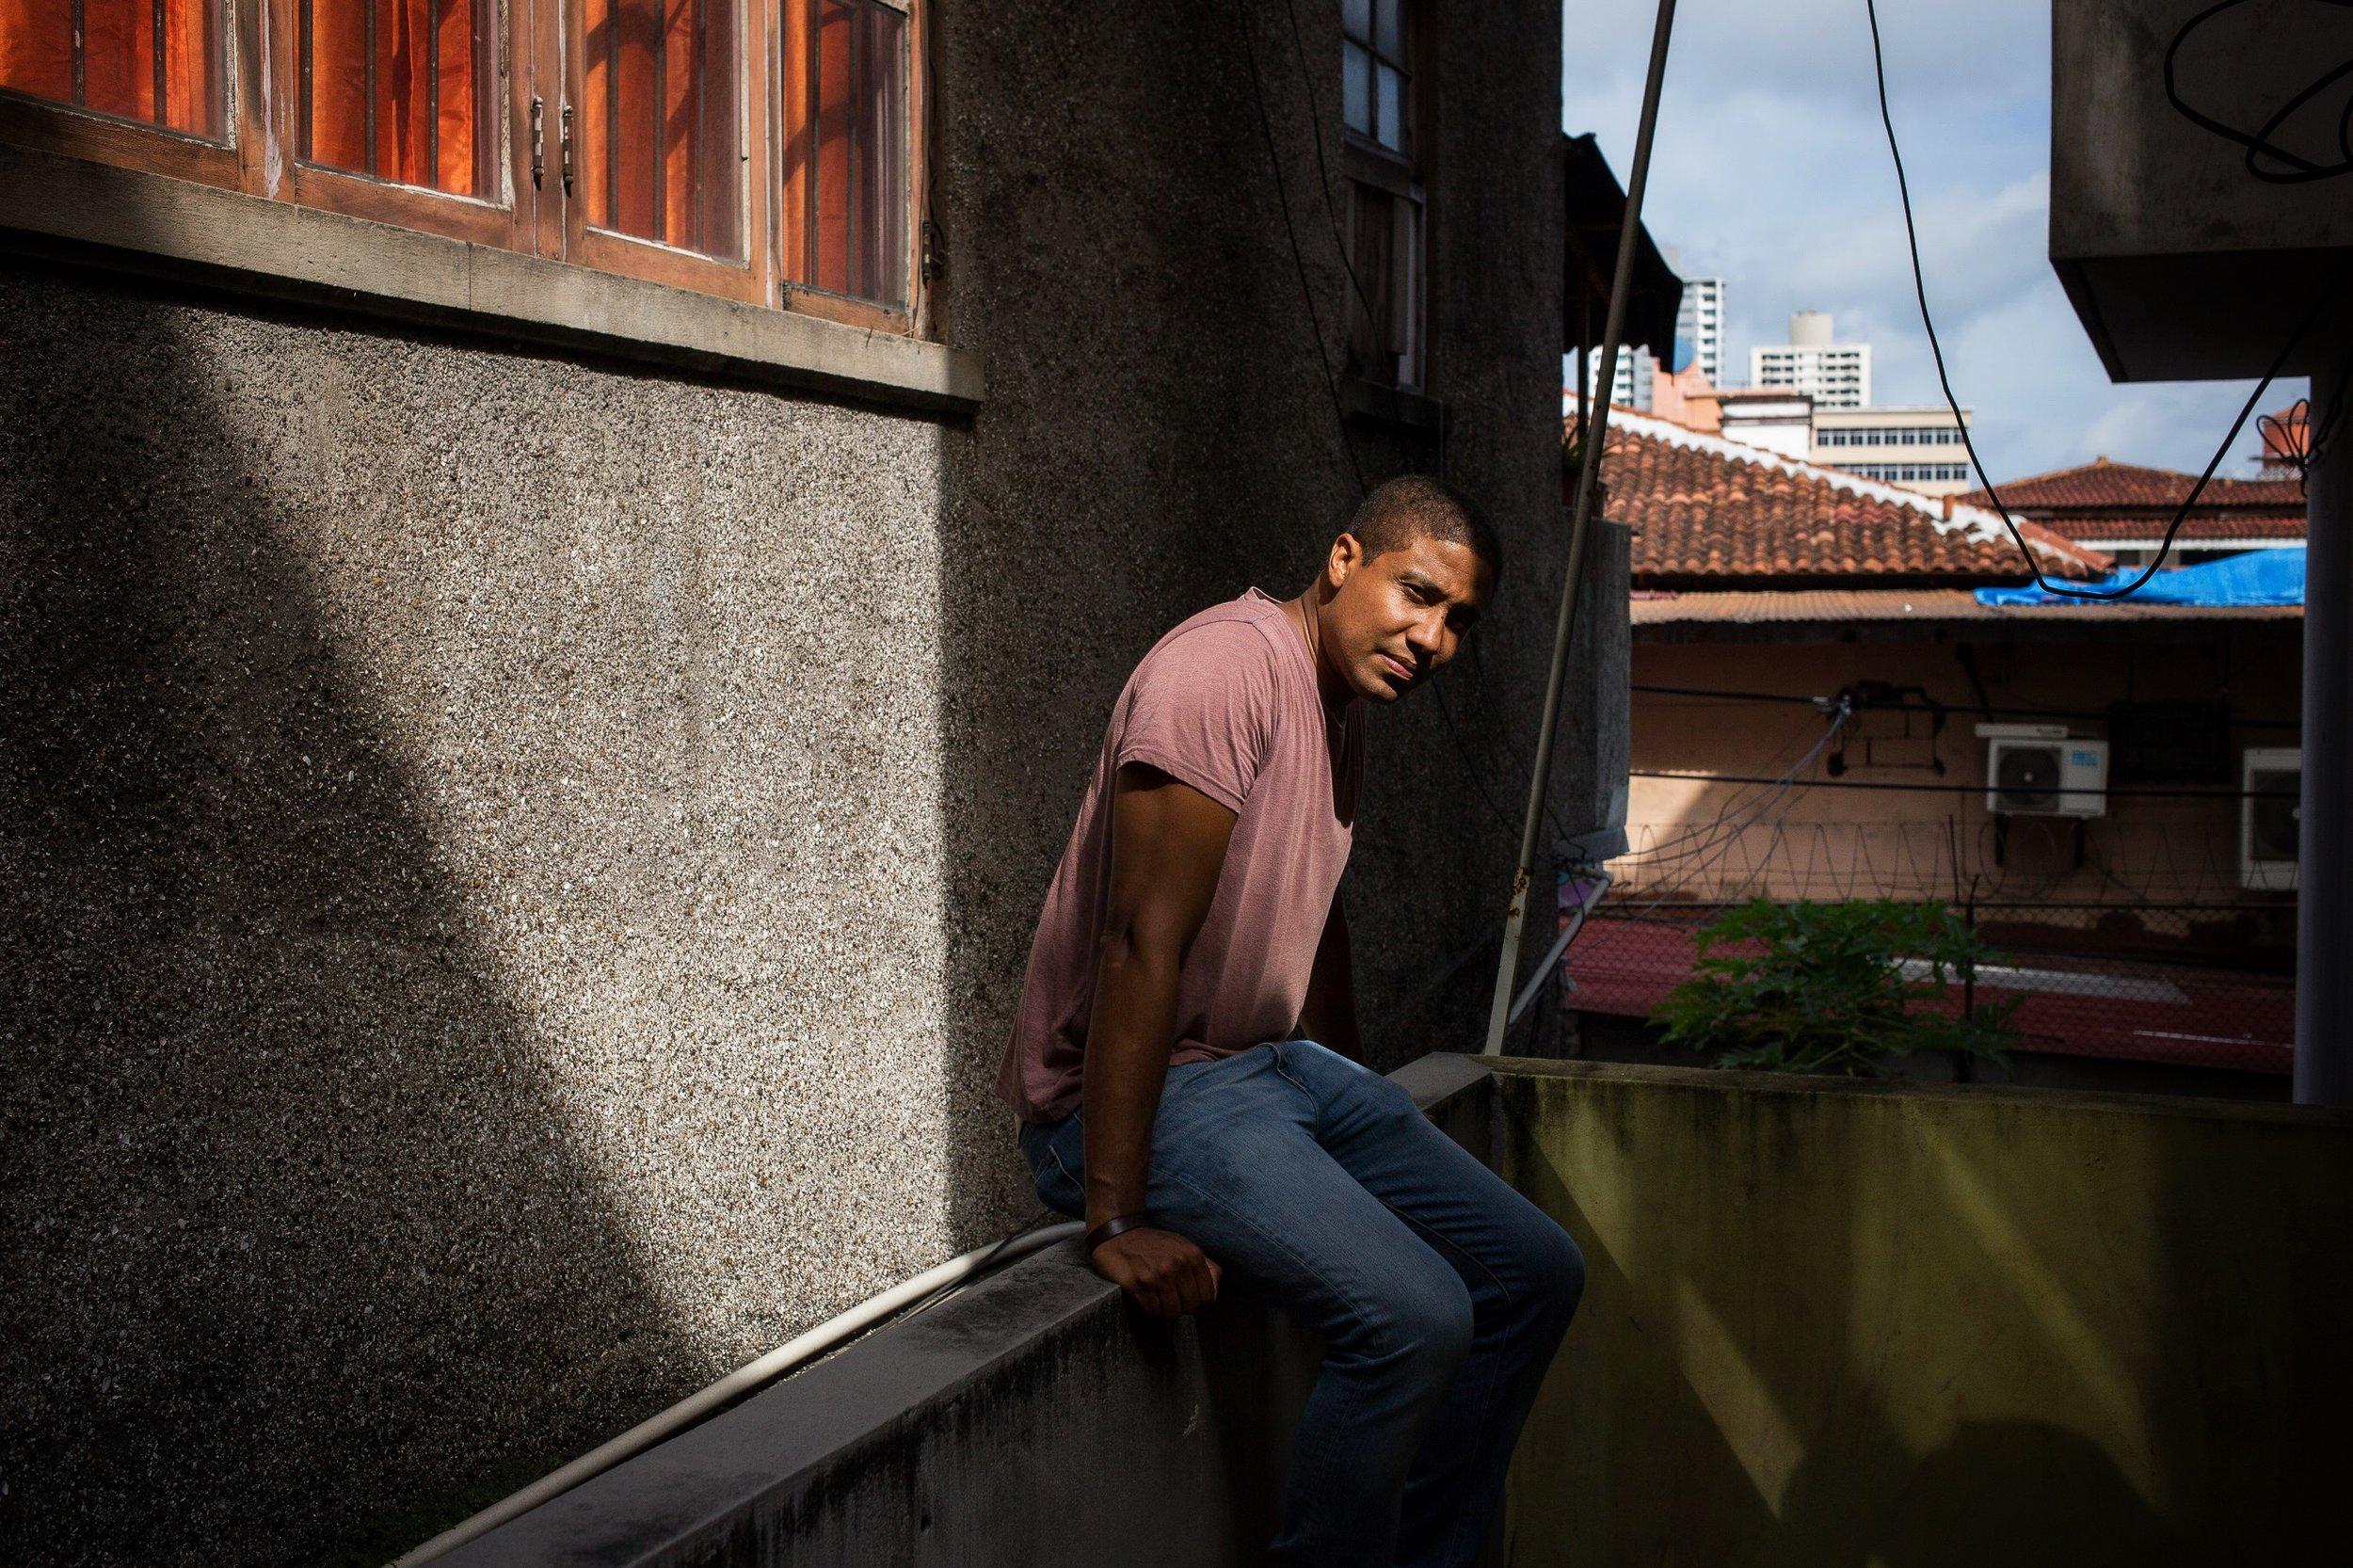 Edwin Hosoomel - somewhere in a city